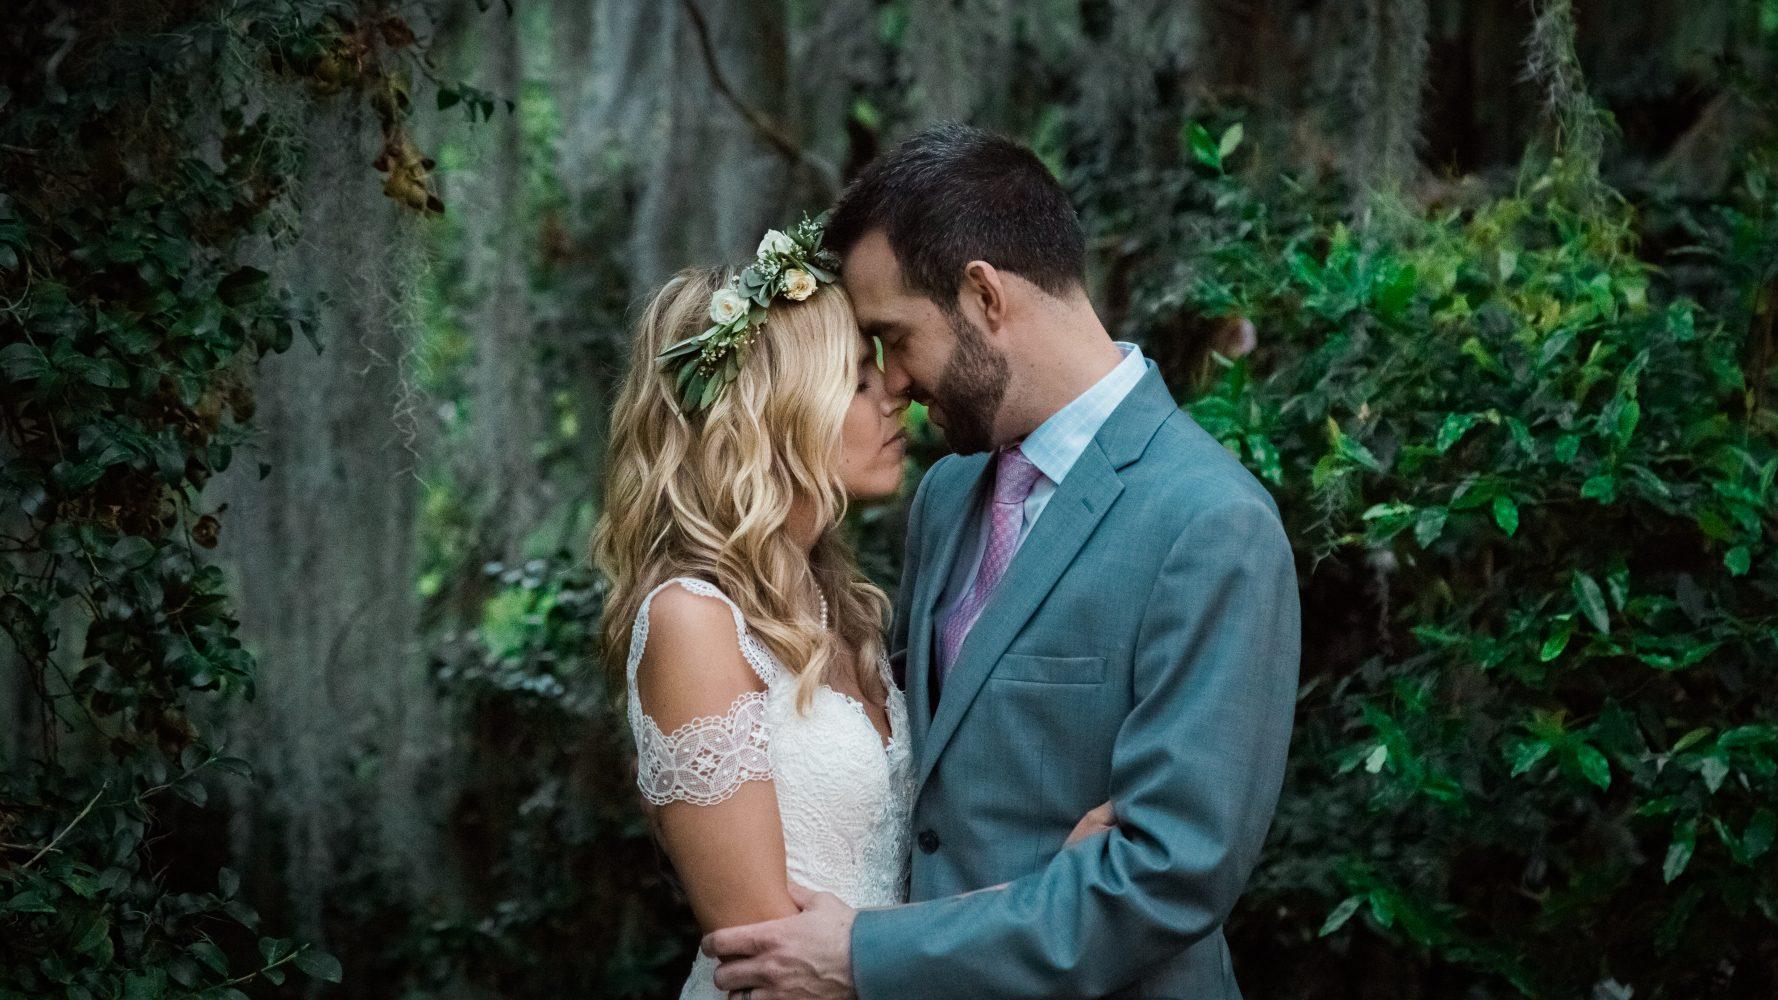 Lindy + Mike | Charleston, South Carolina | The Legare Waring House